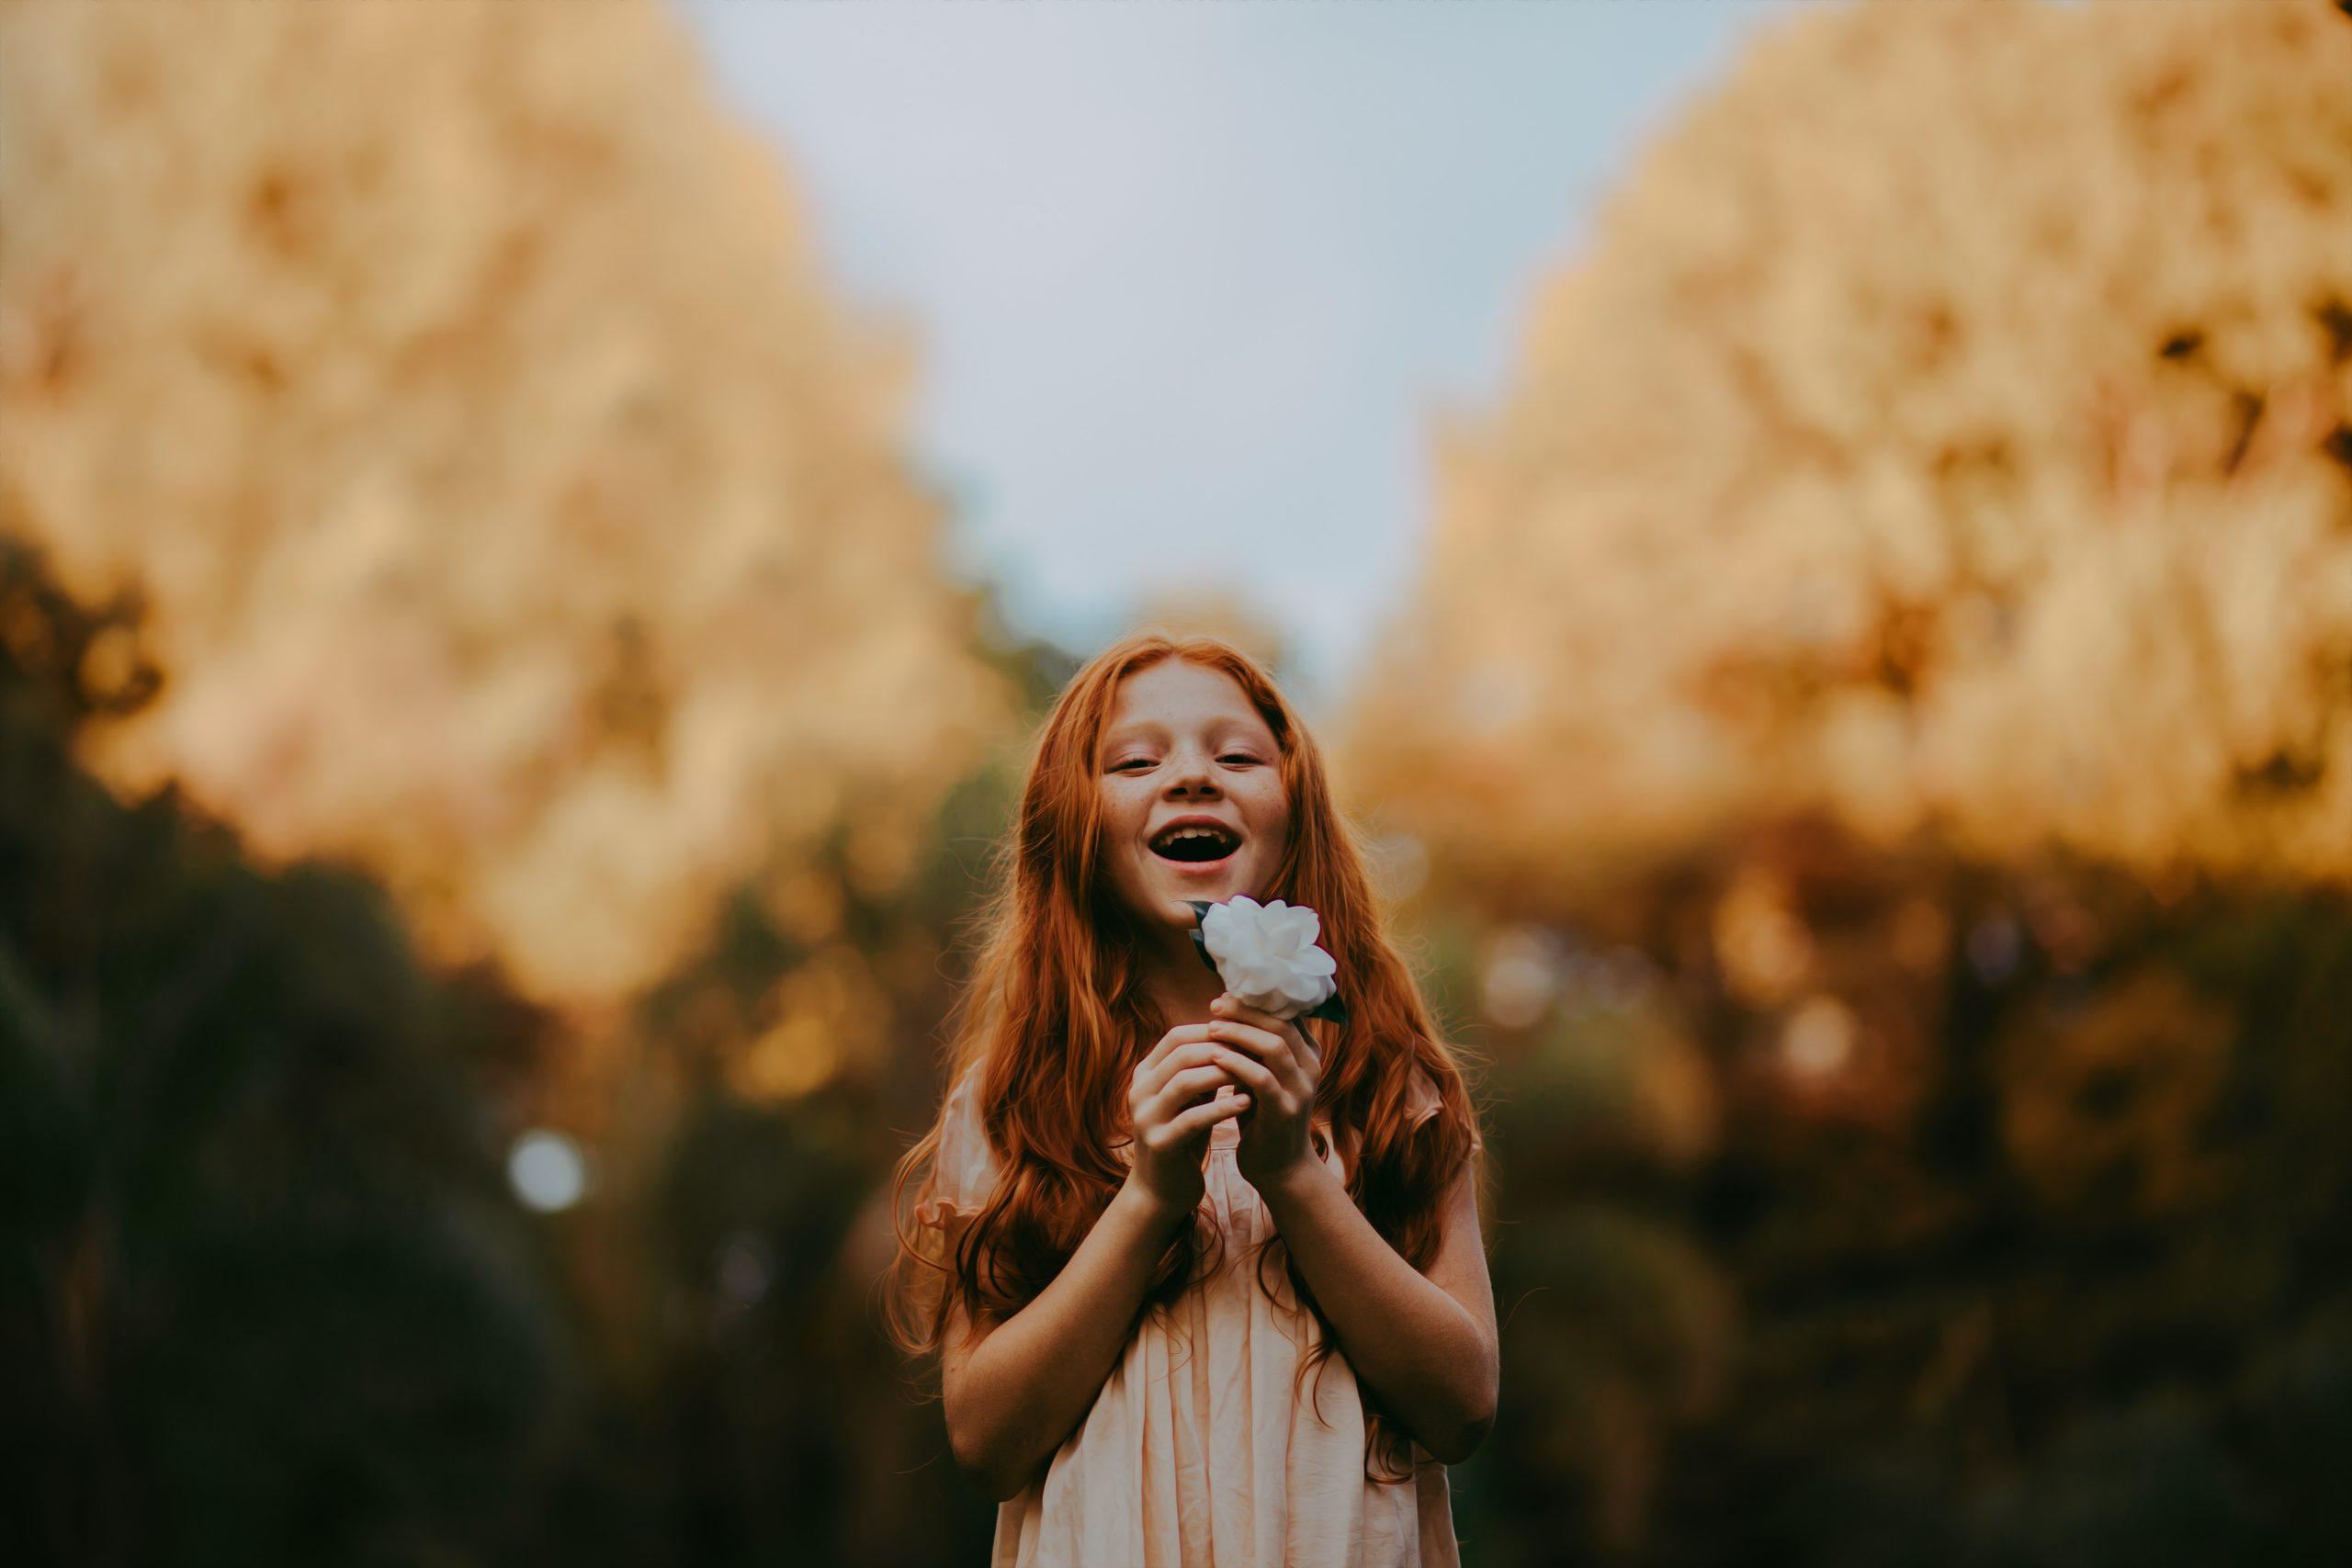 Week 4 – Be joyful, prayerful and thankful-Matheus Bertelli